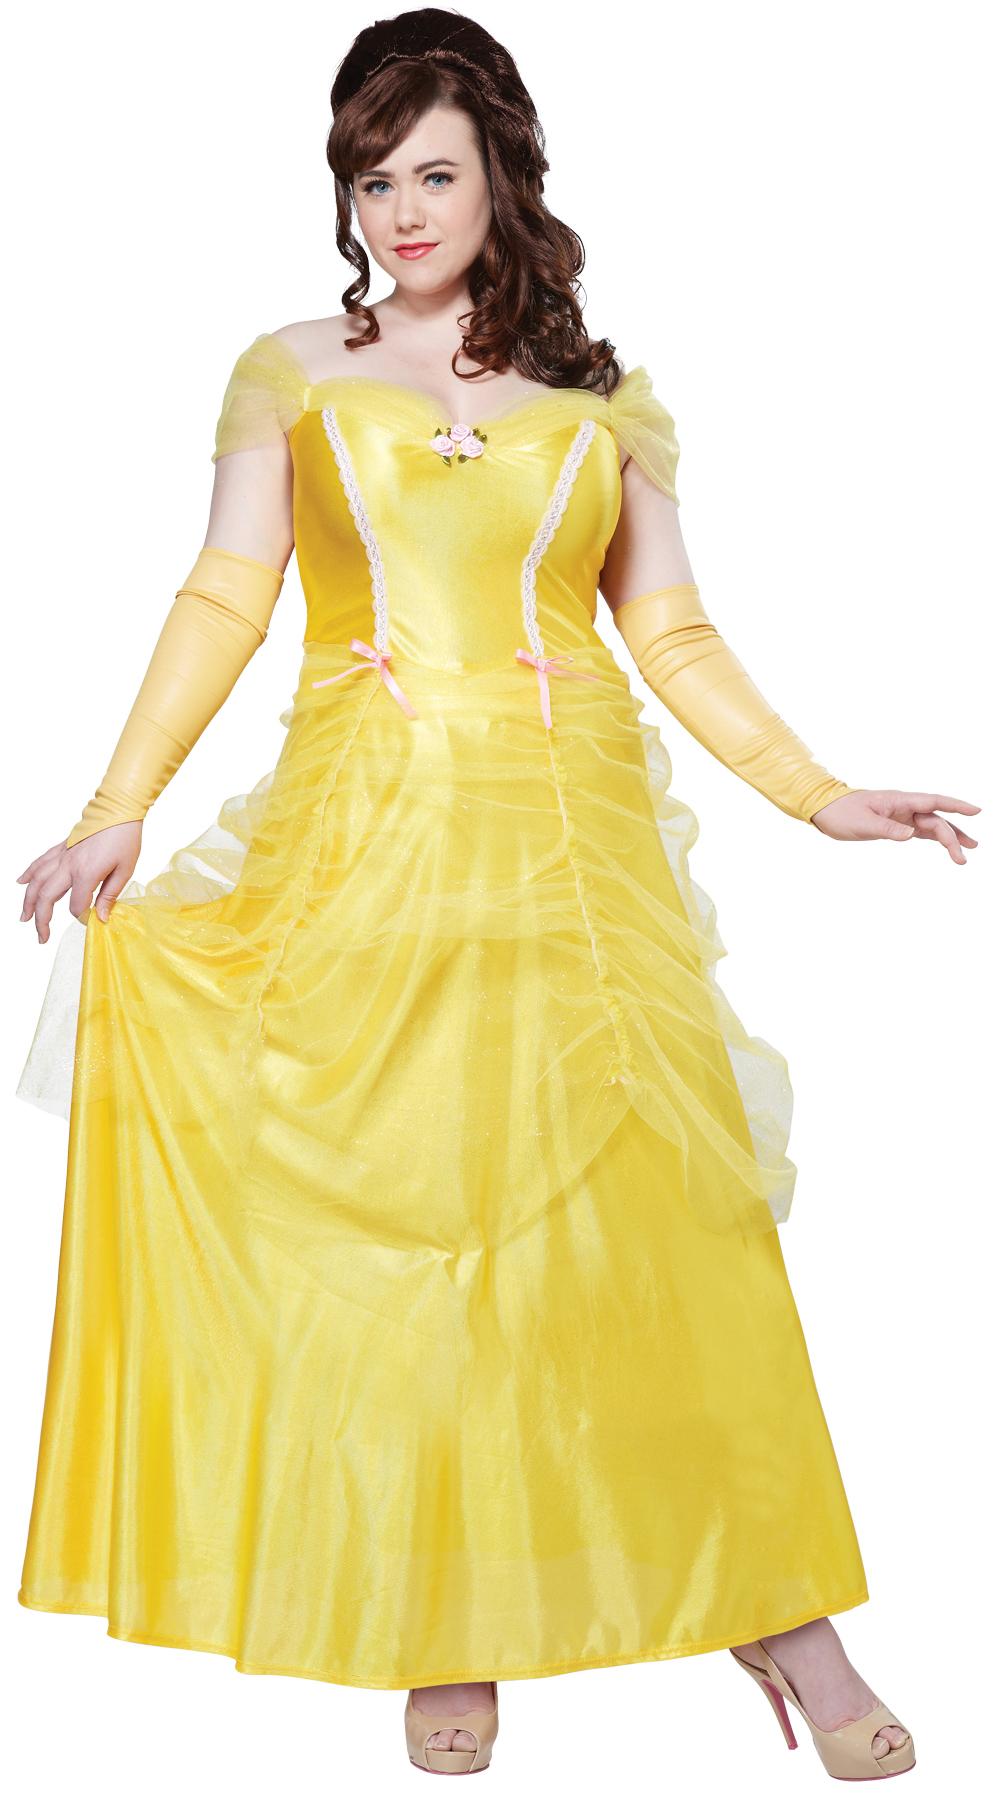 princess belle costume for women wwwimgkidcom the